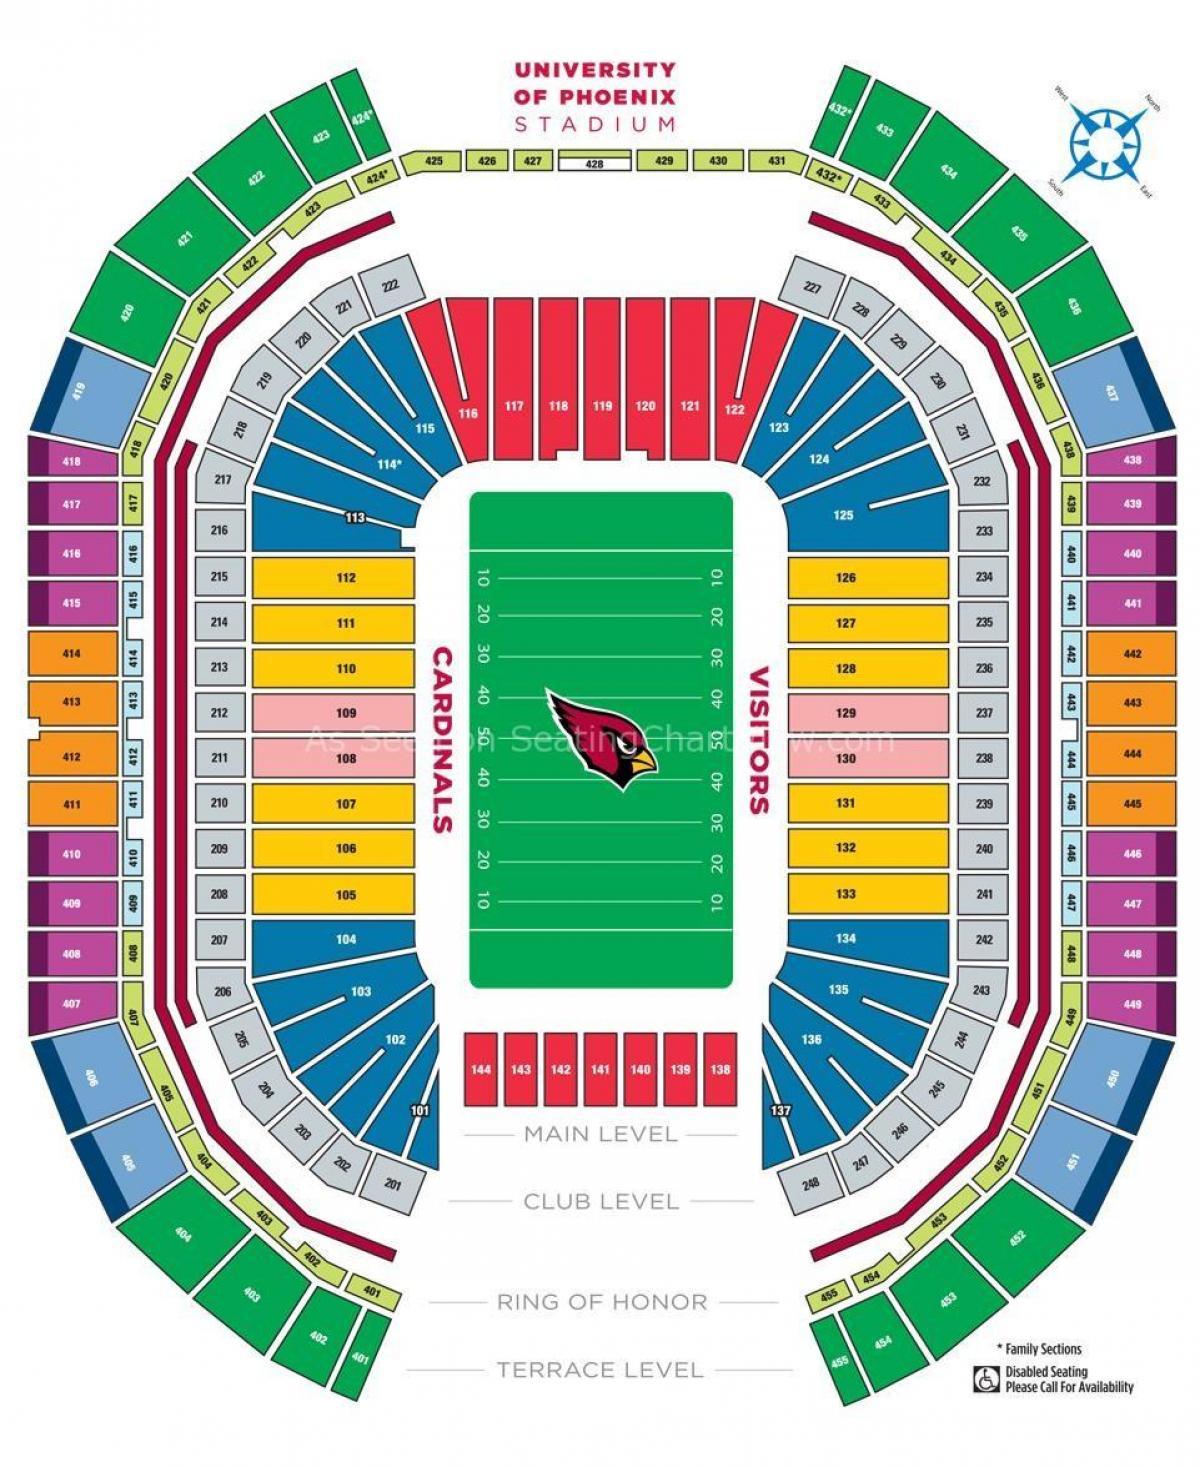 Cardinals Seating Map Cardinal stadium seating map   University of Phoenix stadium